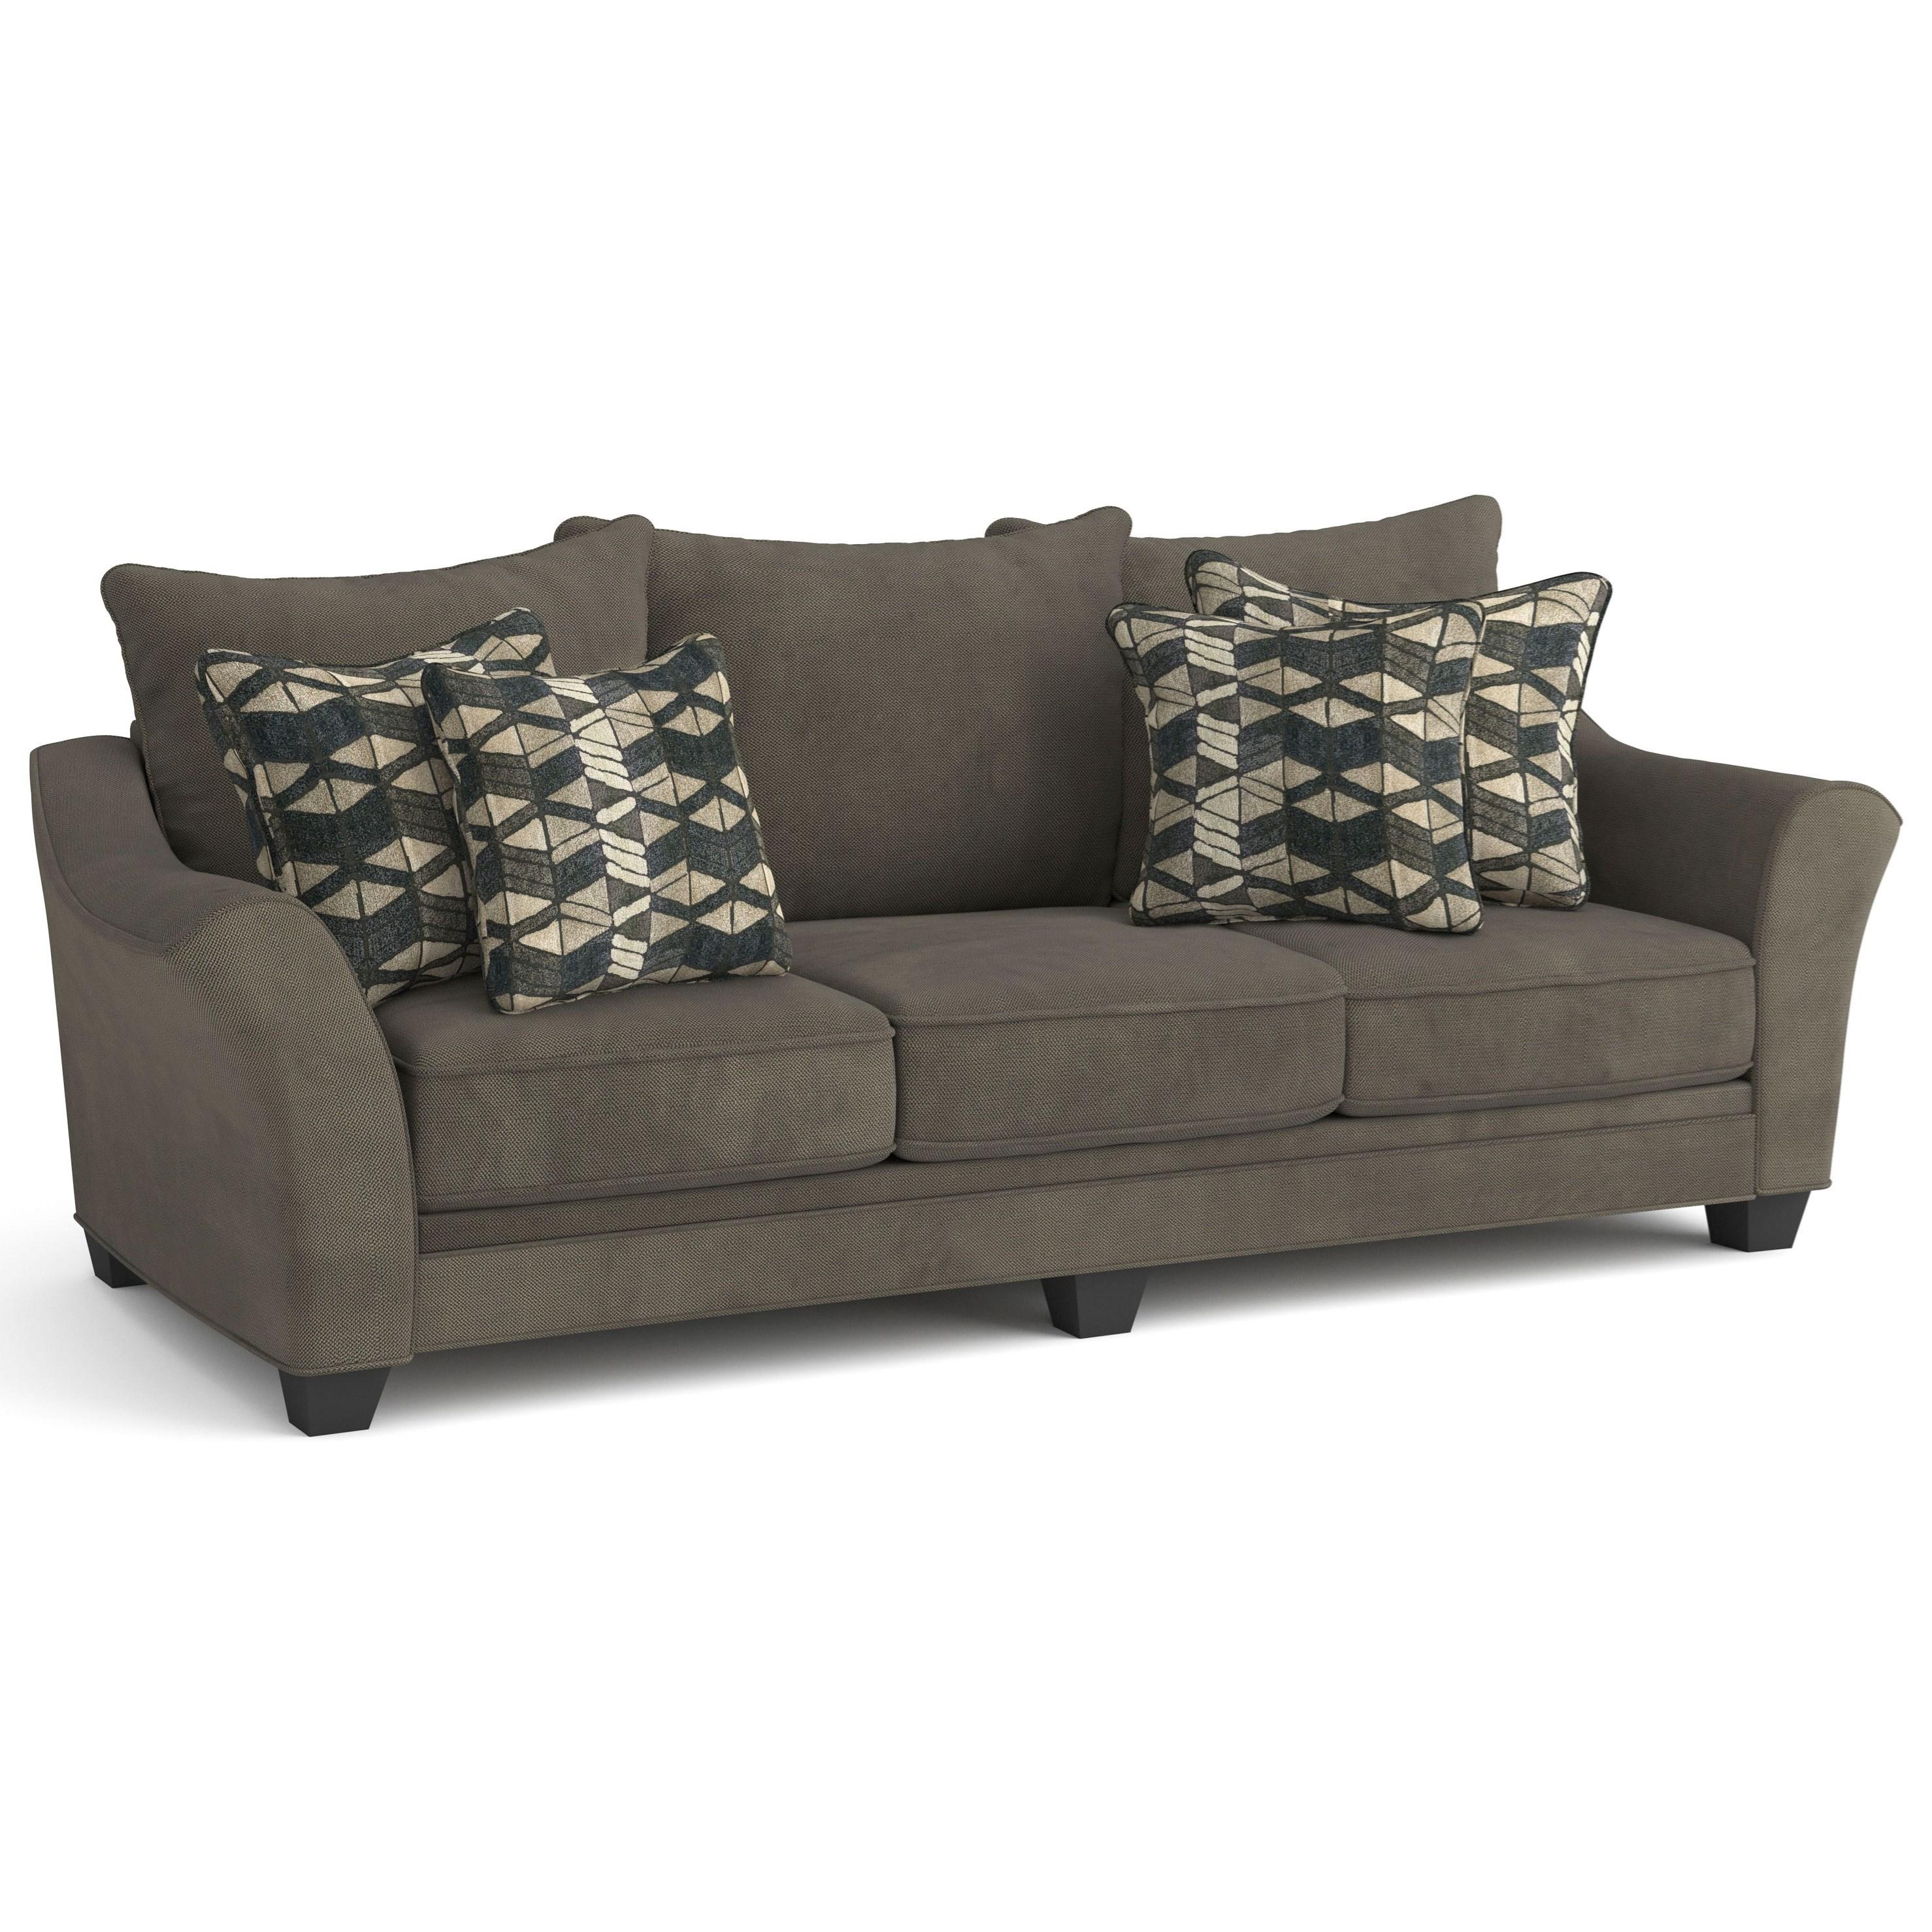 Denali Sofa by Sunset Home at Walker's Furniture